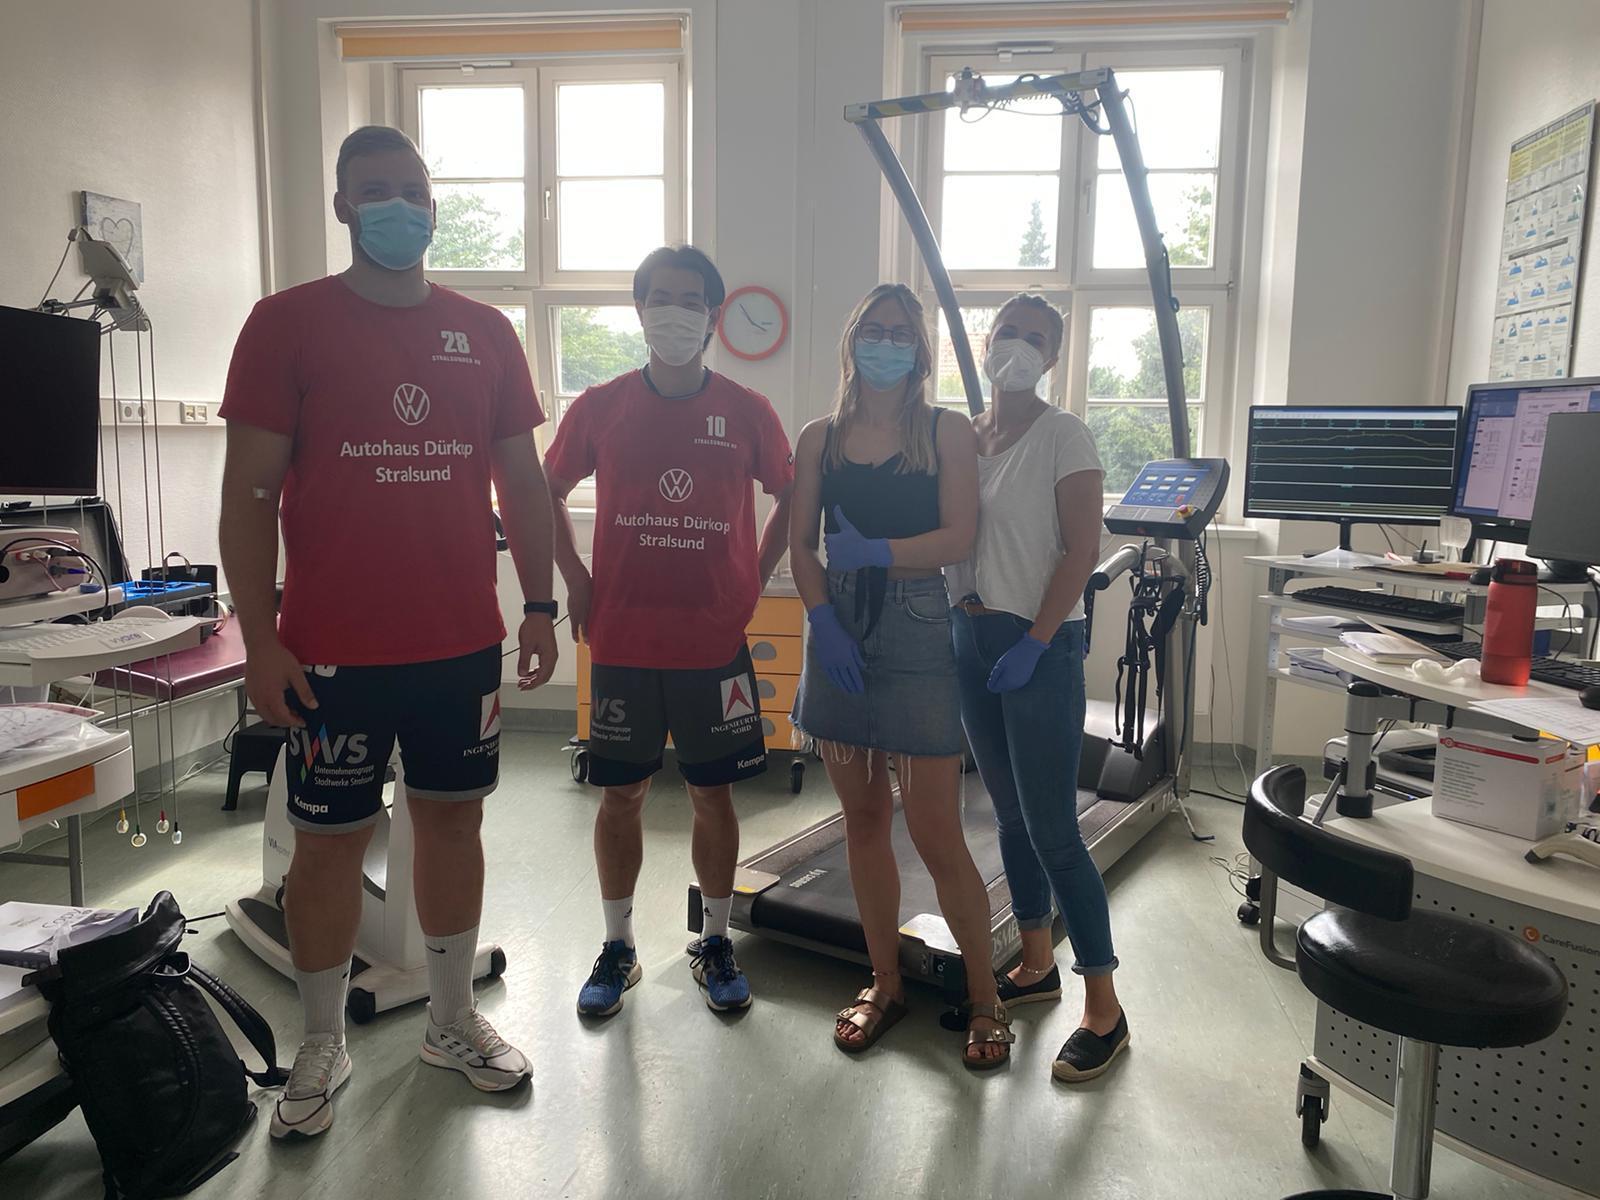 You are currently viewing SHV Männer zum Leistungscheck an der Universitätsmedizin Greifswald (UMG)